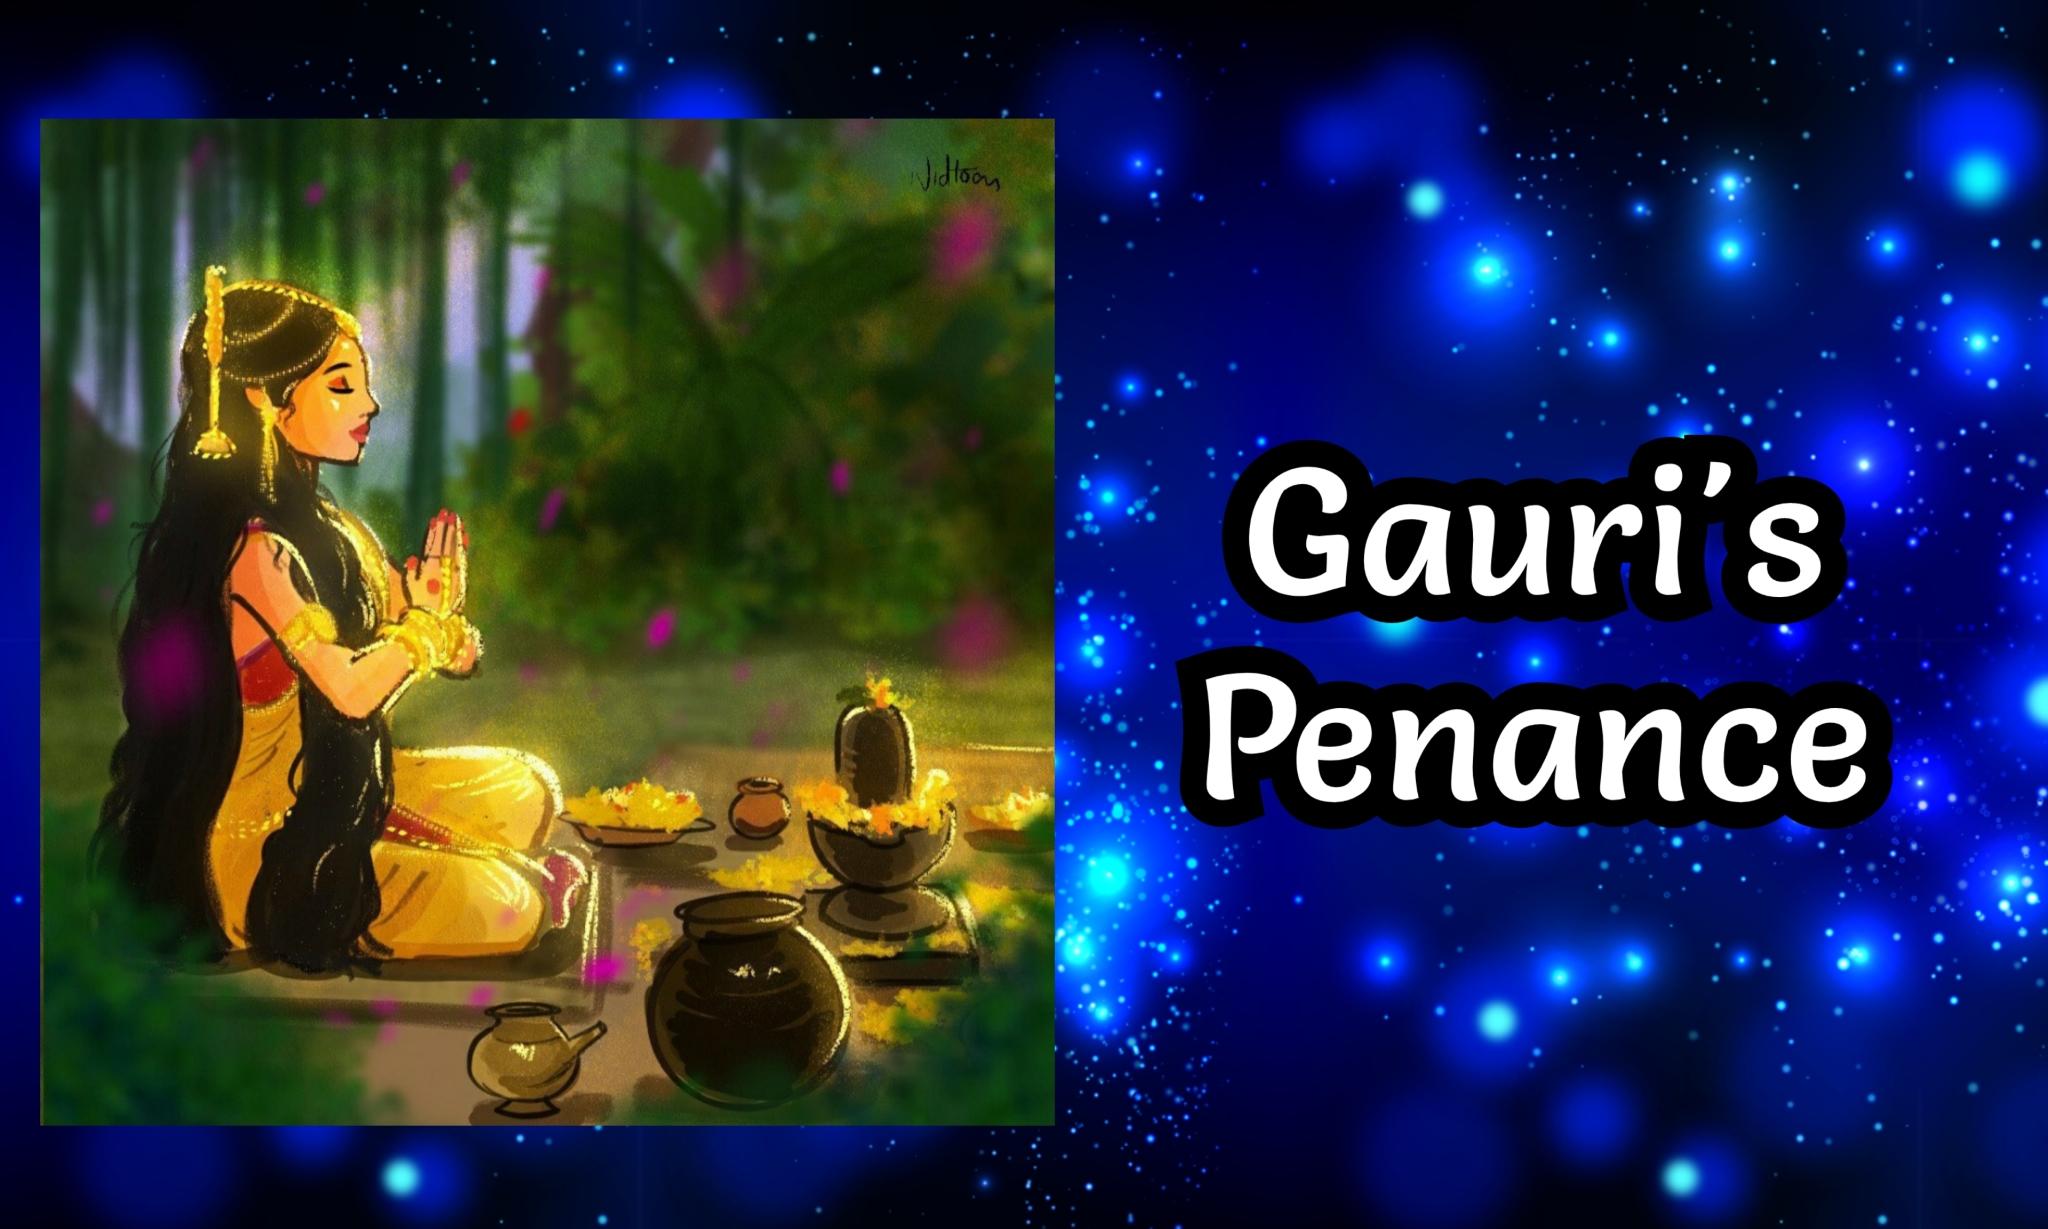 Gauri's Penance